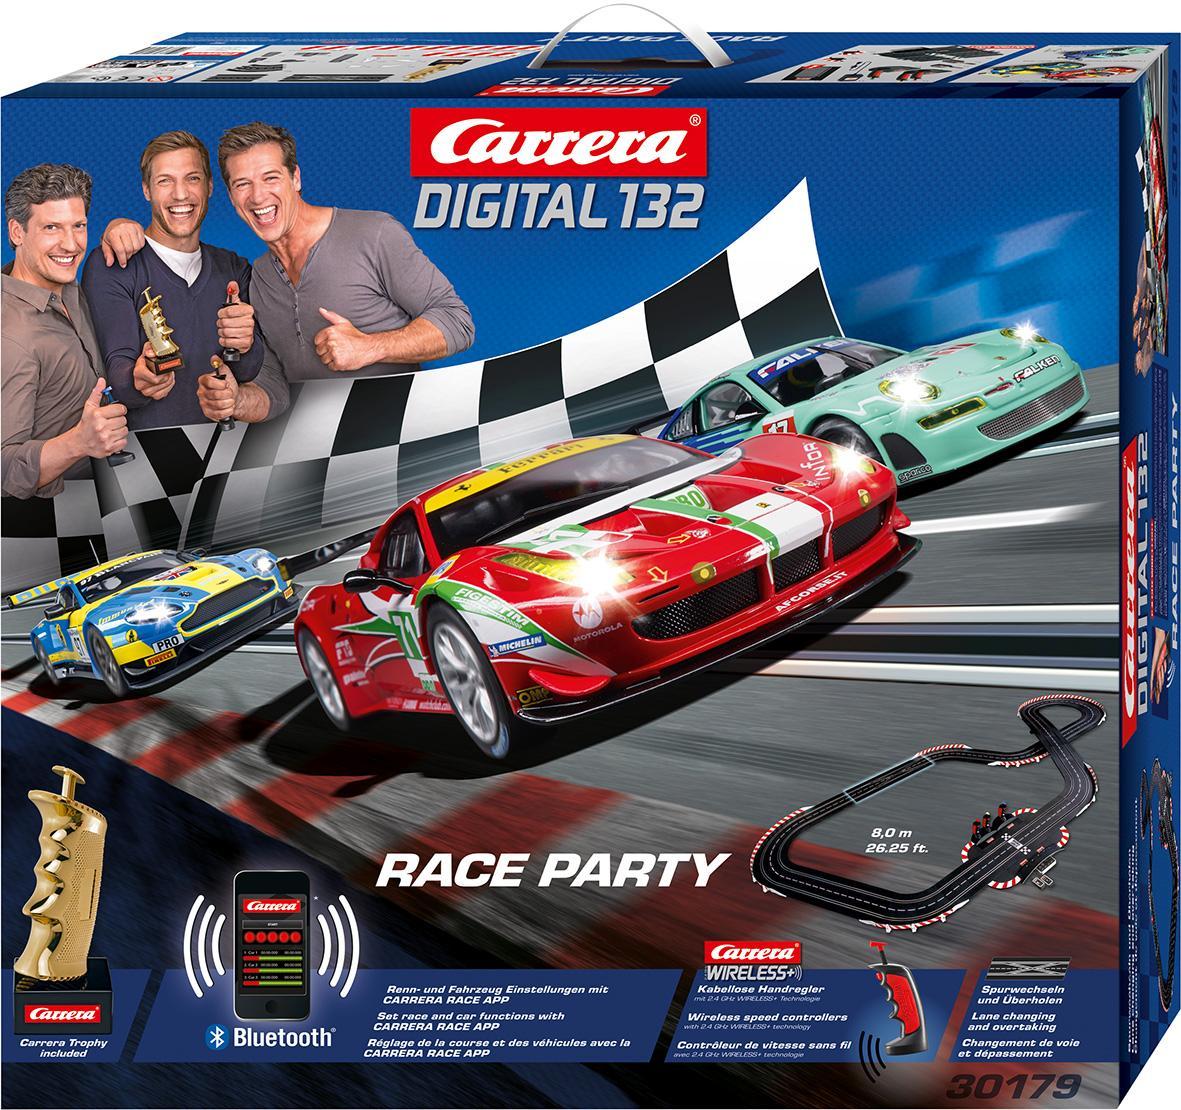 carrera digital 132 carrera race party toys. Black Bedroom Furniture Sets. Home Design Ideas